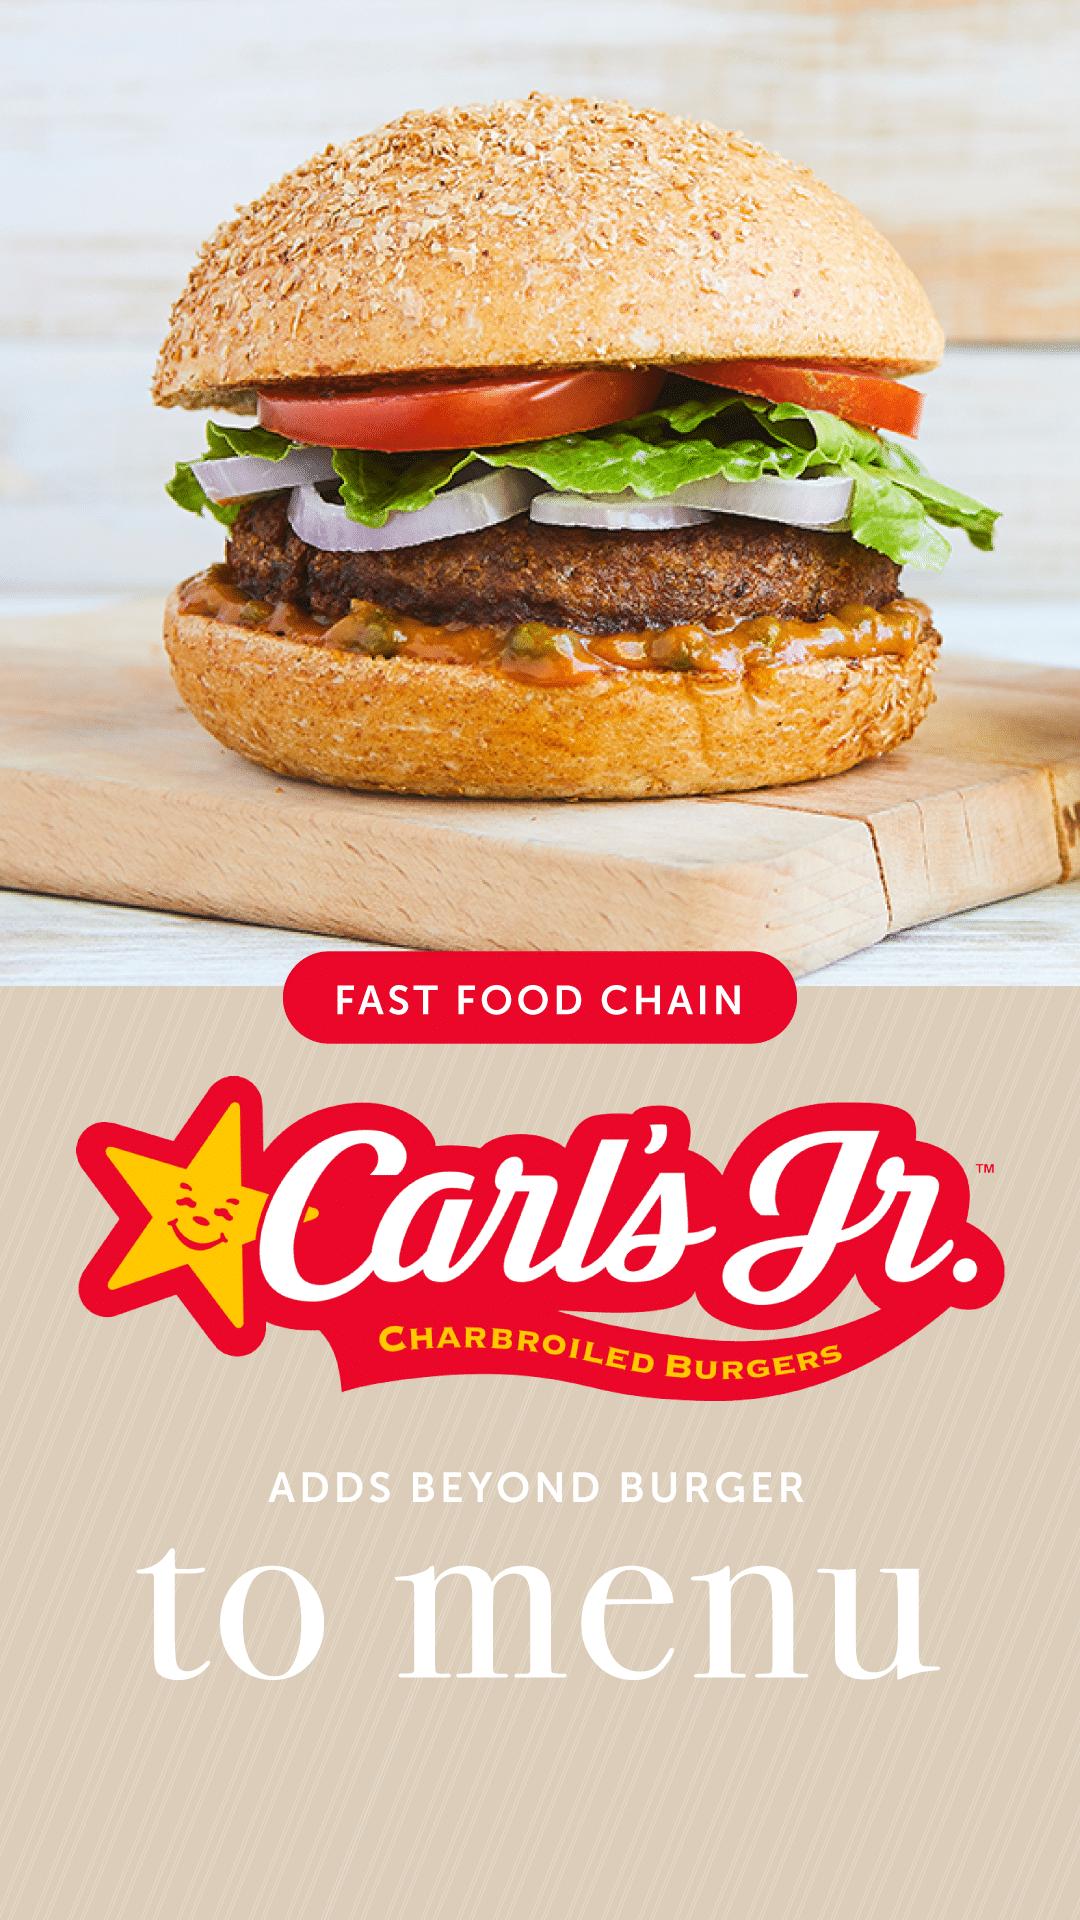 Fast-Food Chain Carl's Jr. Adds Beyond Burger to Menu